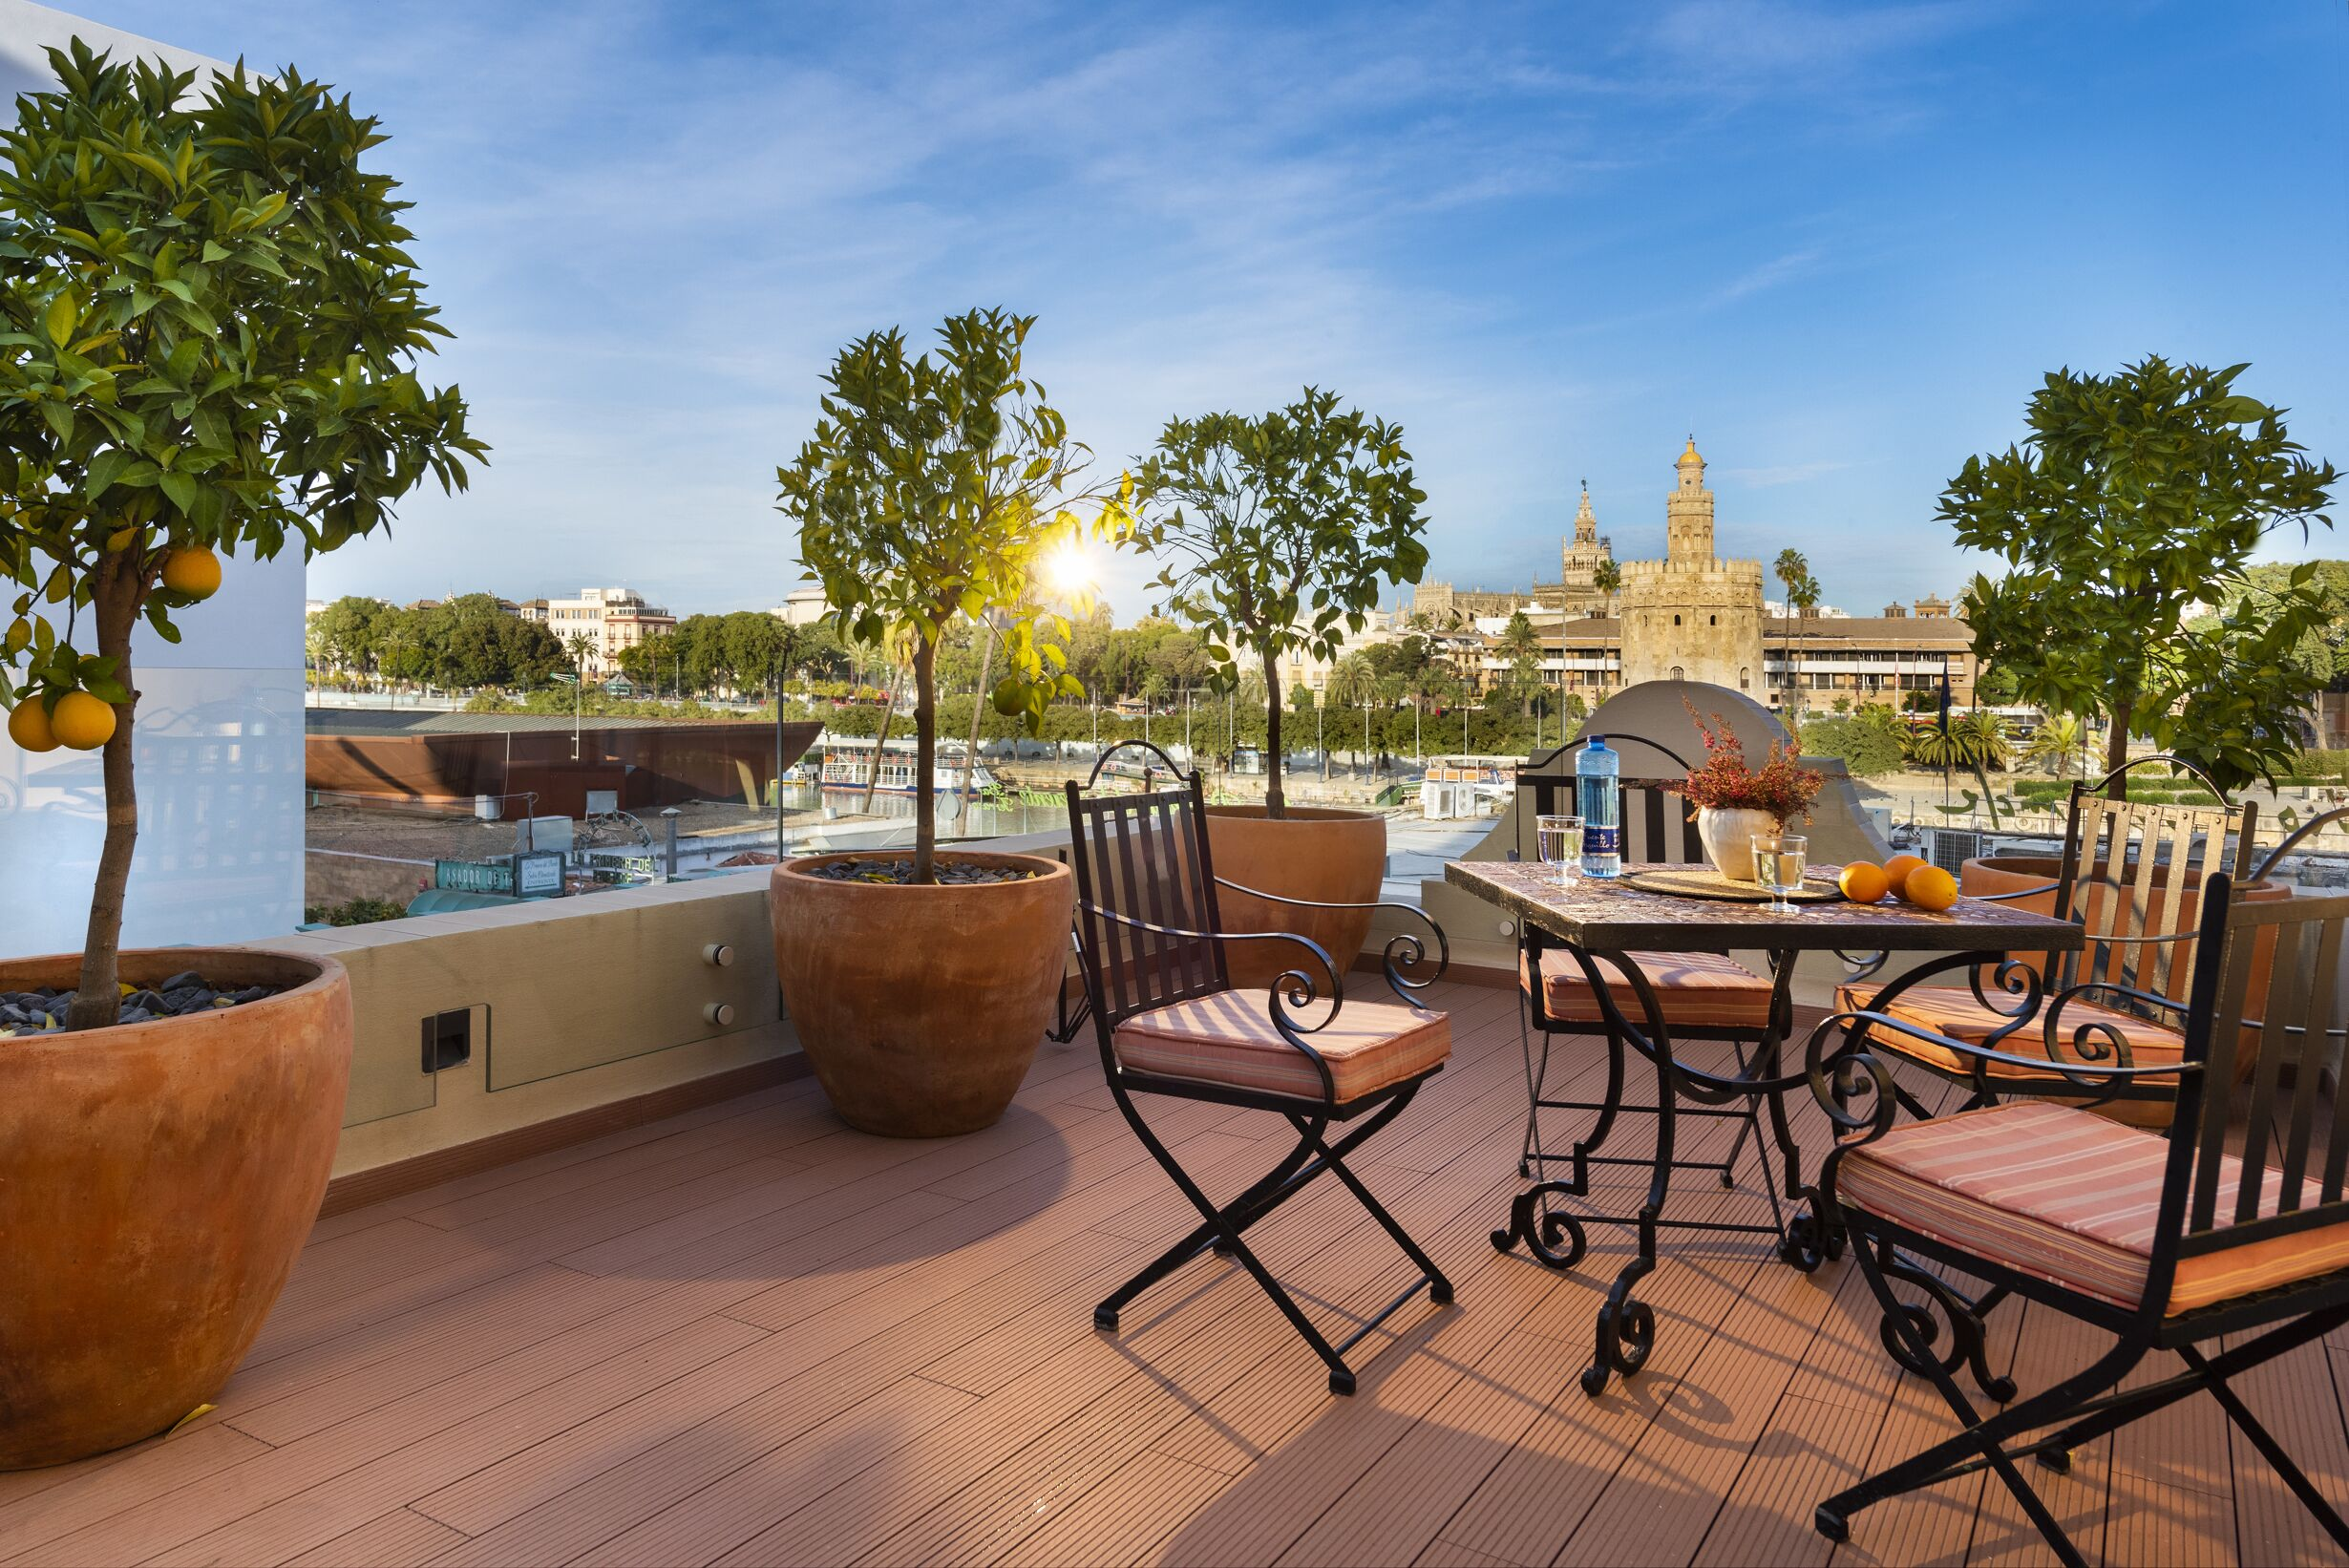 Casa Del Poeta Triana Suite And Homes Seville